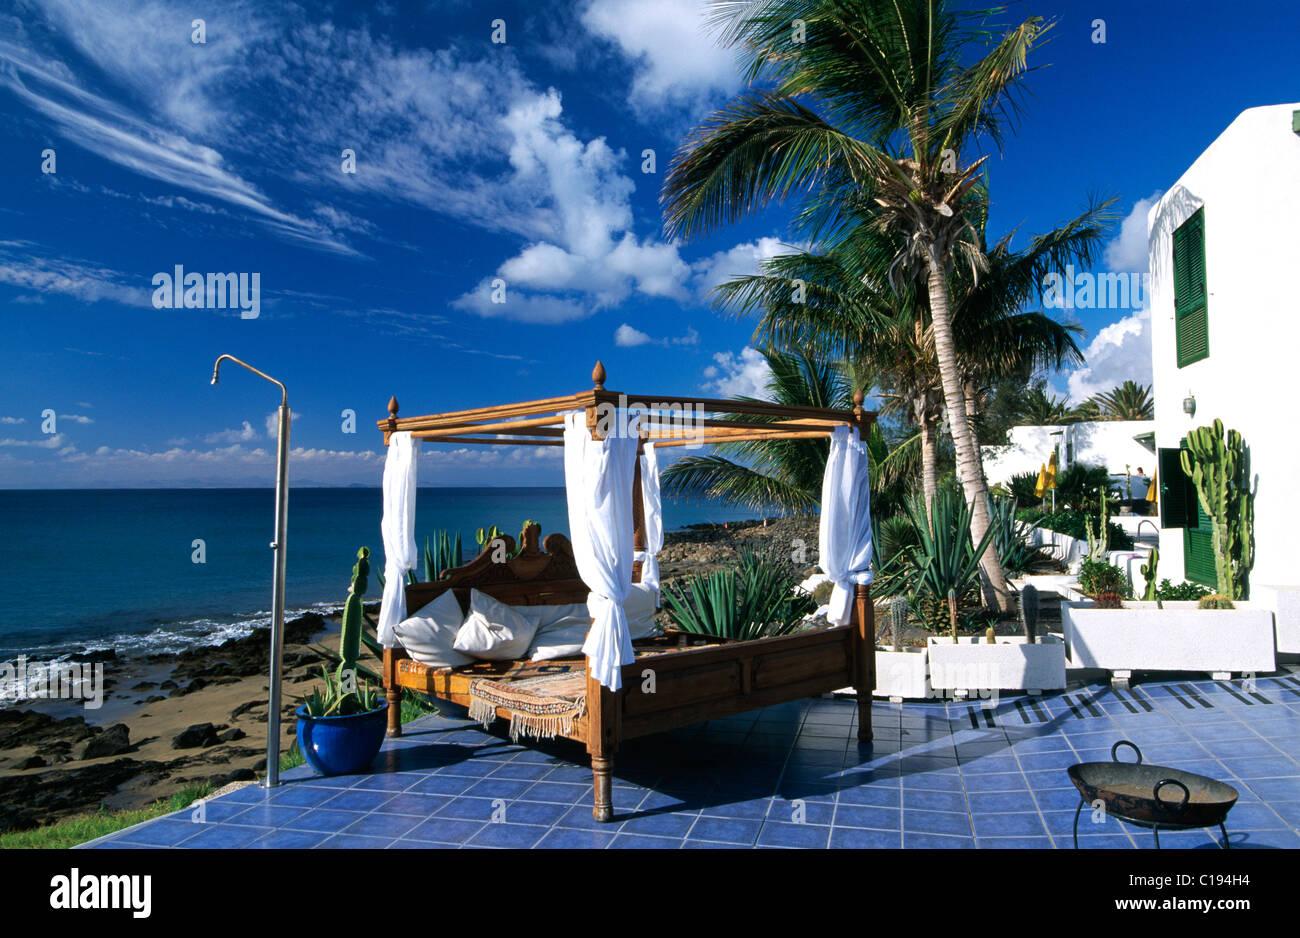 La Ola Club de plage à Puerto del Carmen, Lanzarote, Canary Islands, Spain, Europe Banque D'Images